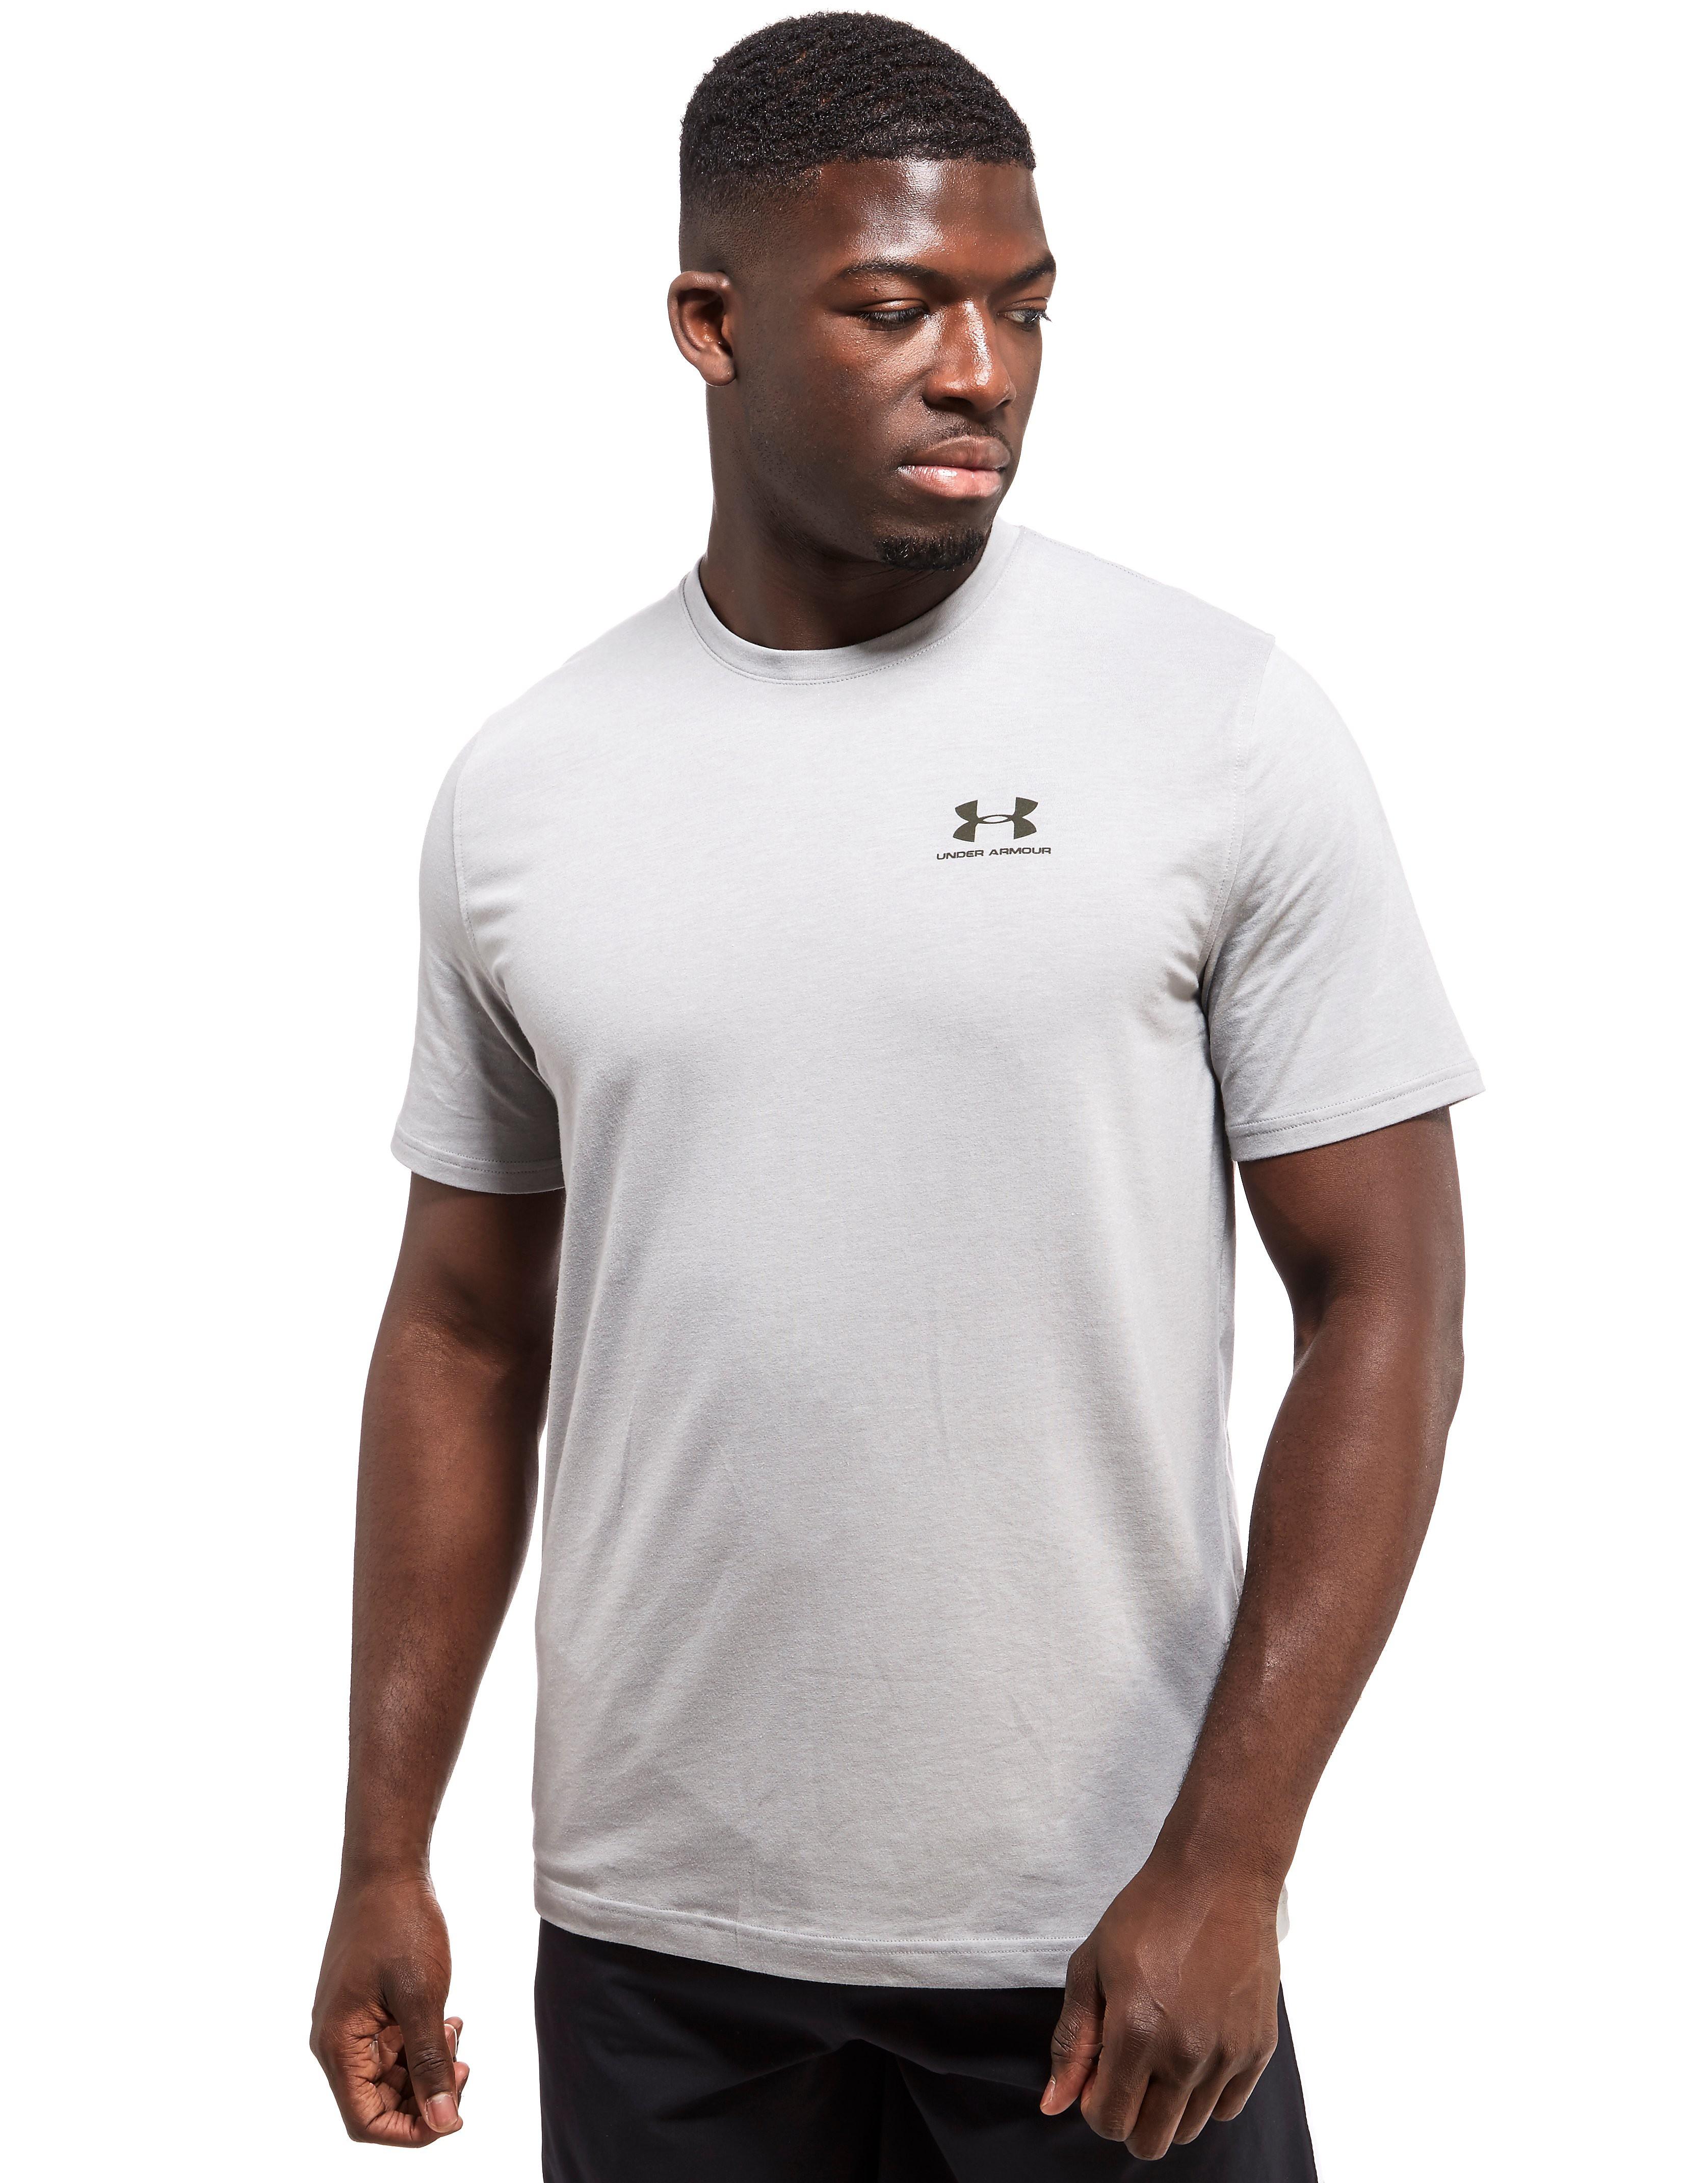 Under Armour T-shirt CC Homme